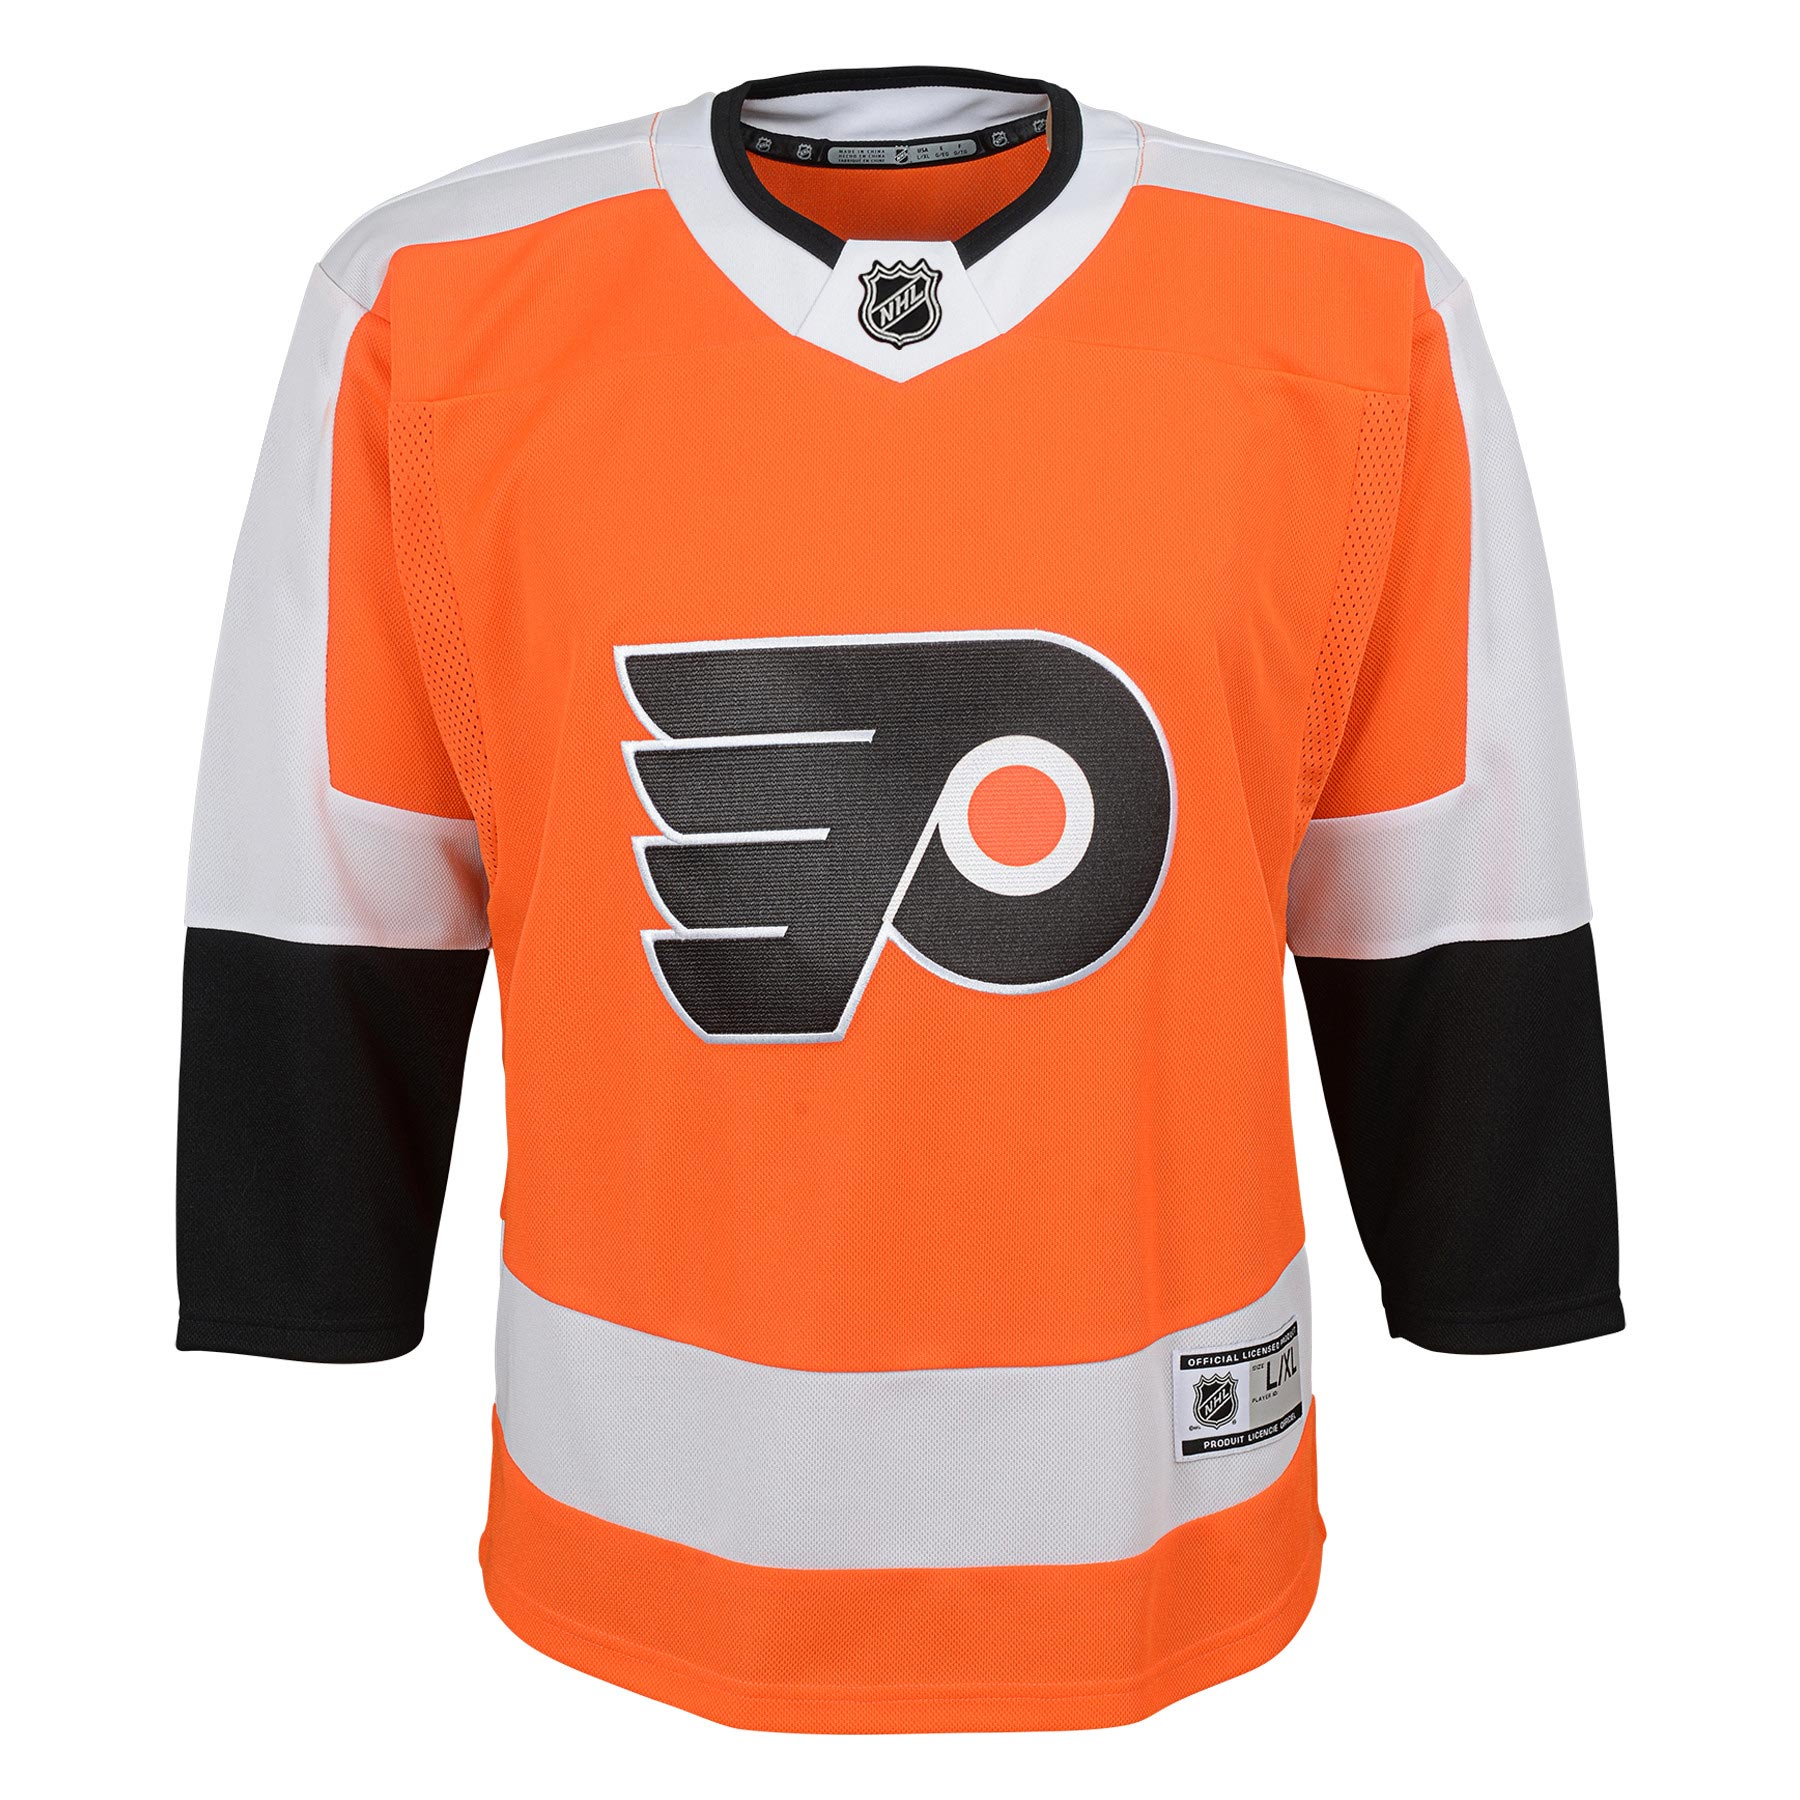 a5633bb0b Philadelphia Flyers NHL Premier Youth Replica Home Hockey Jersey ...